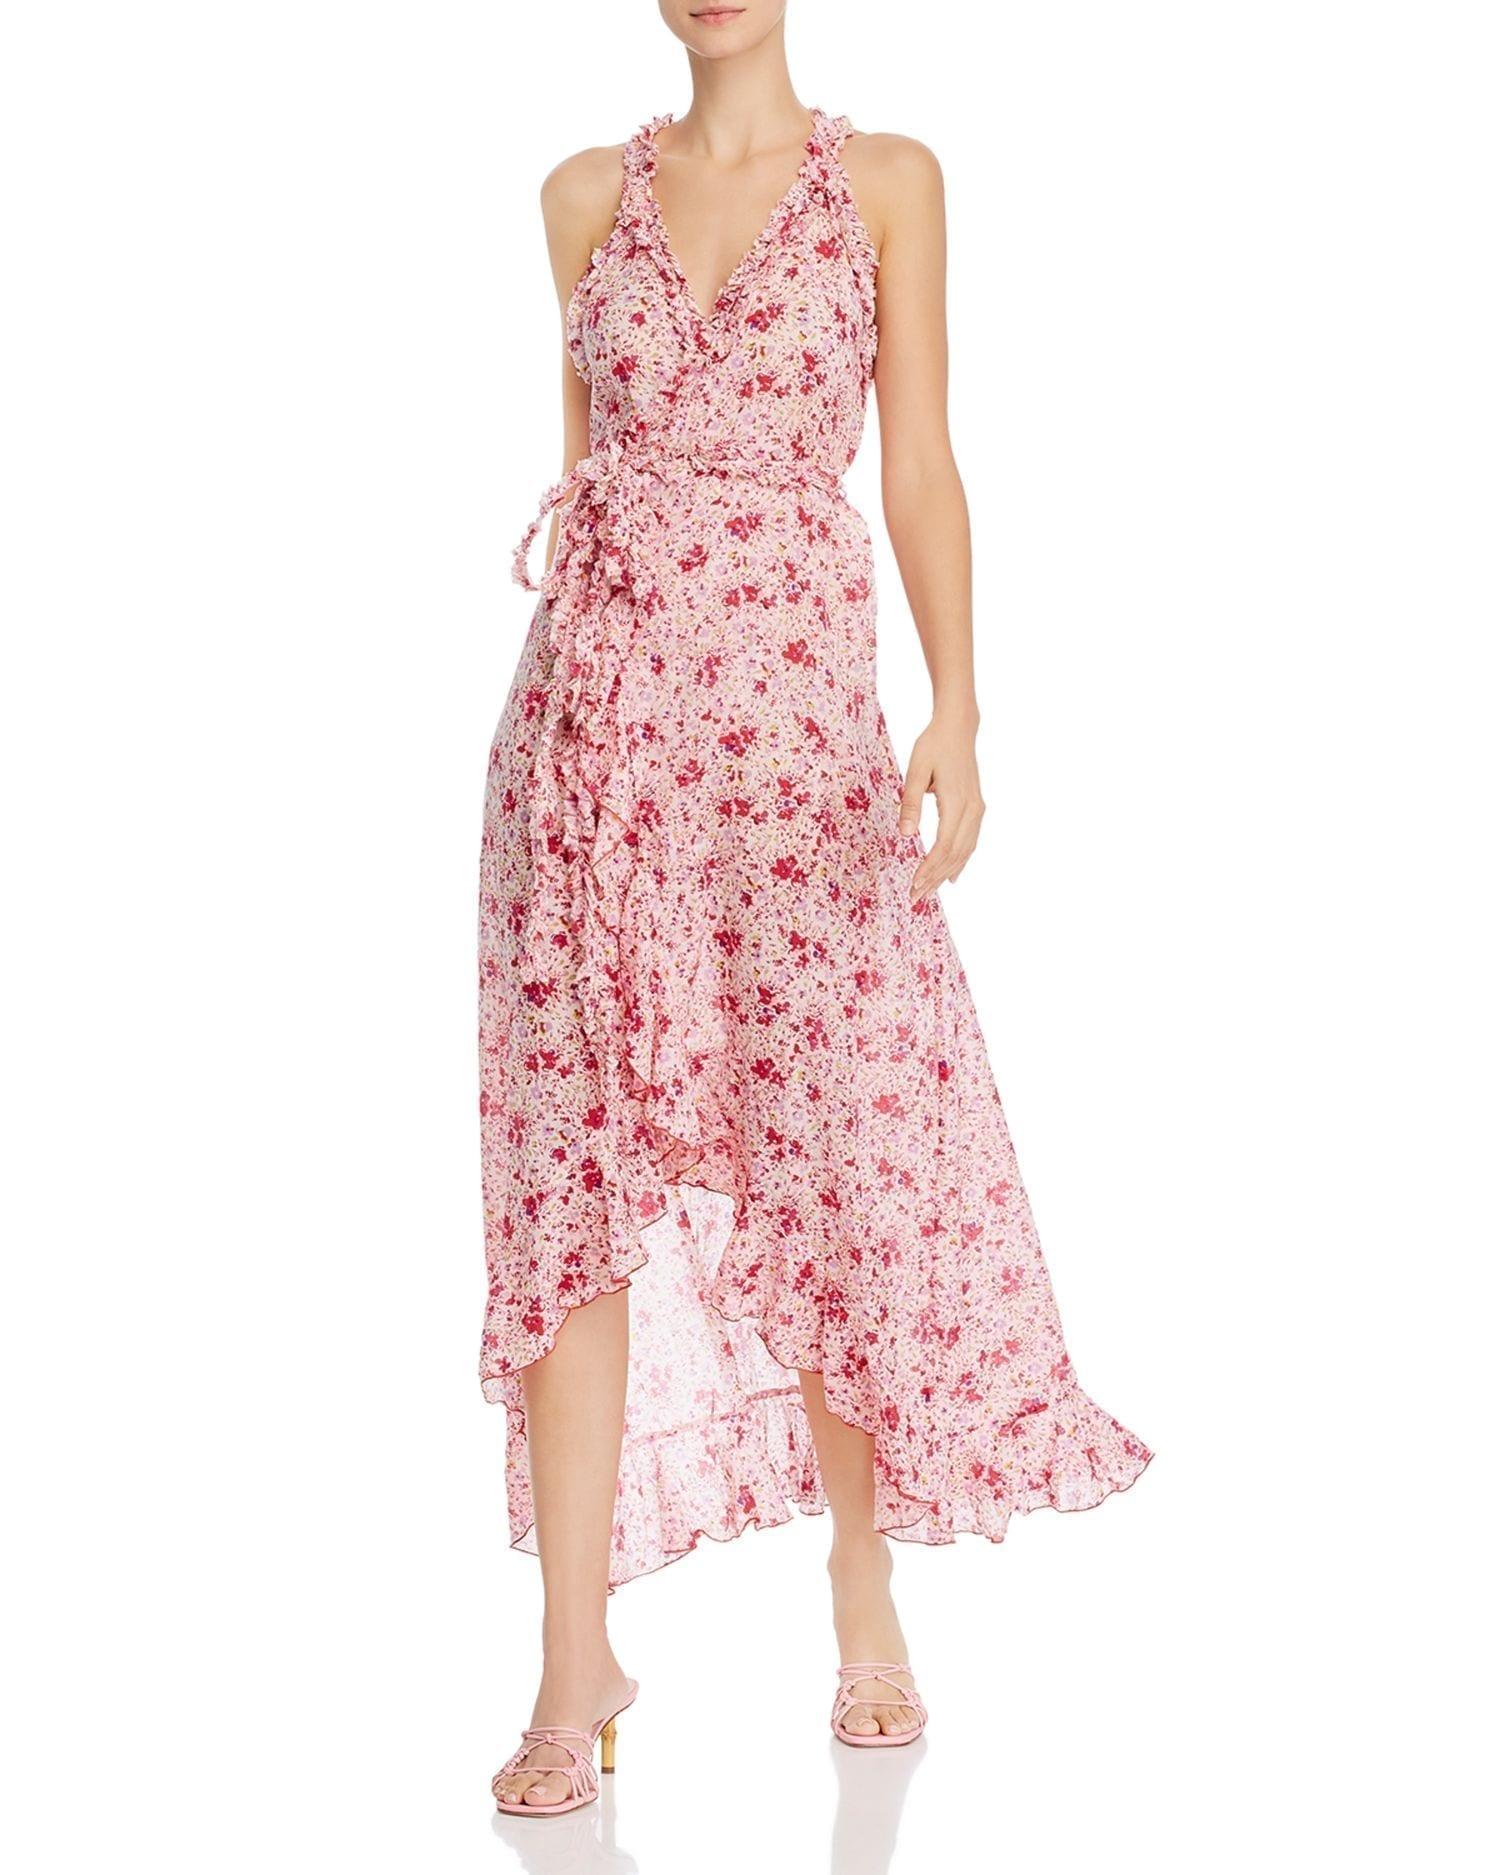 POUPETTE ST. BARTH Printed Maxi Dress